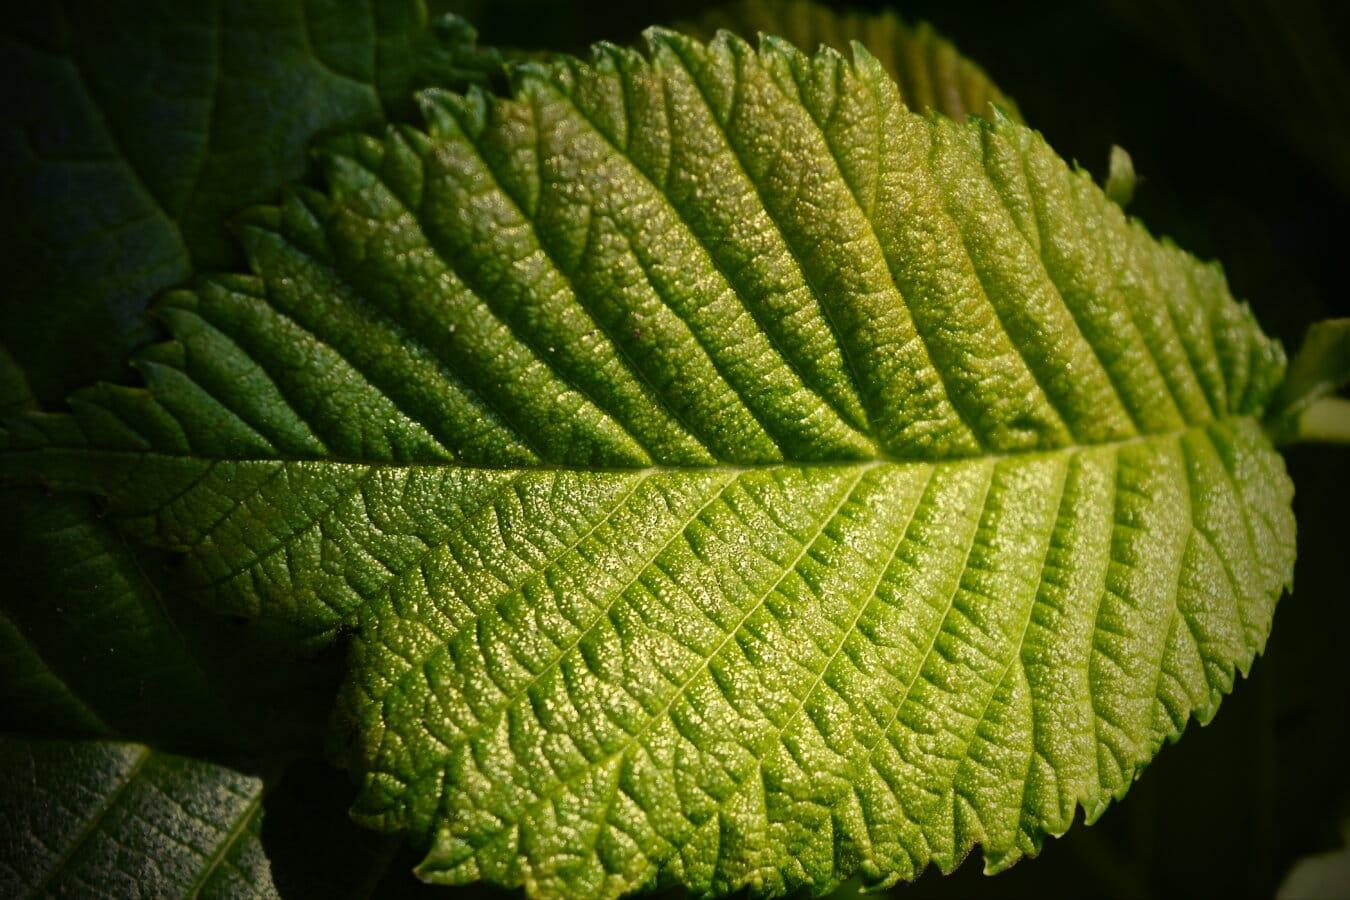 grünes Blatt, Elm, Schatten, aus nächster Nähe, Sonnenlicht, Blatt, Natur, Blätter, Anlage, Struktur